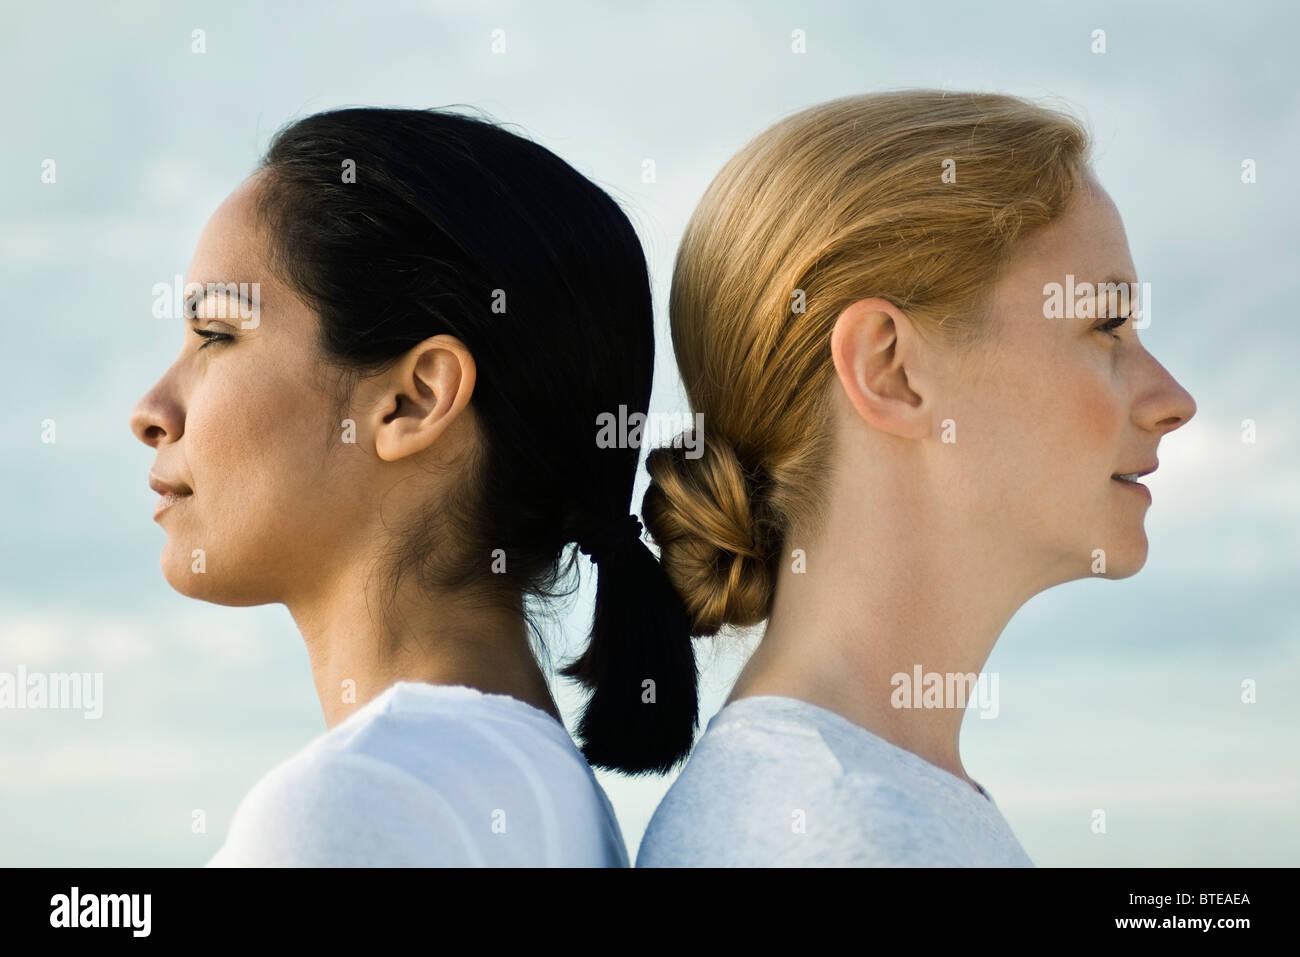 Women back to back, portrait - Stock Image